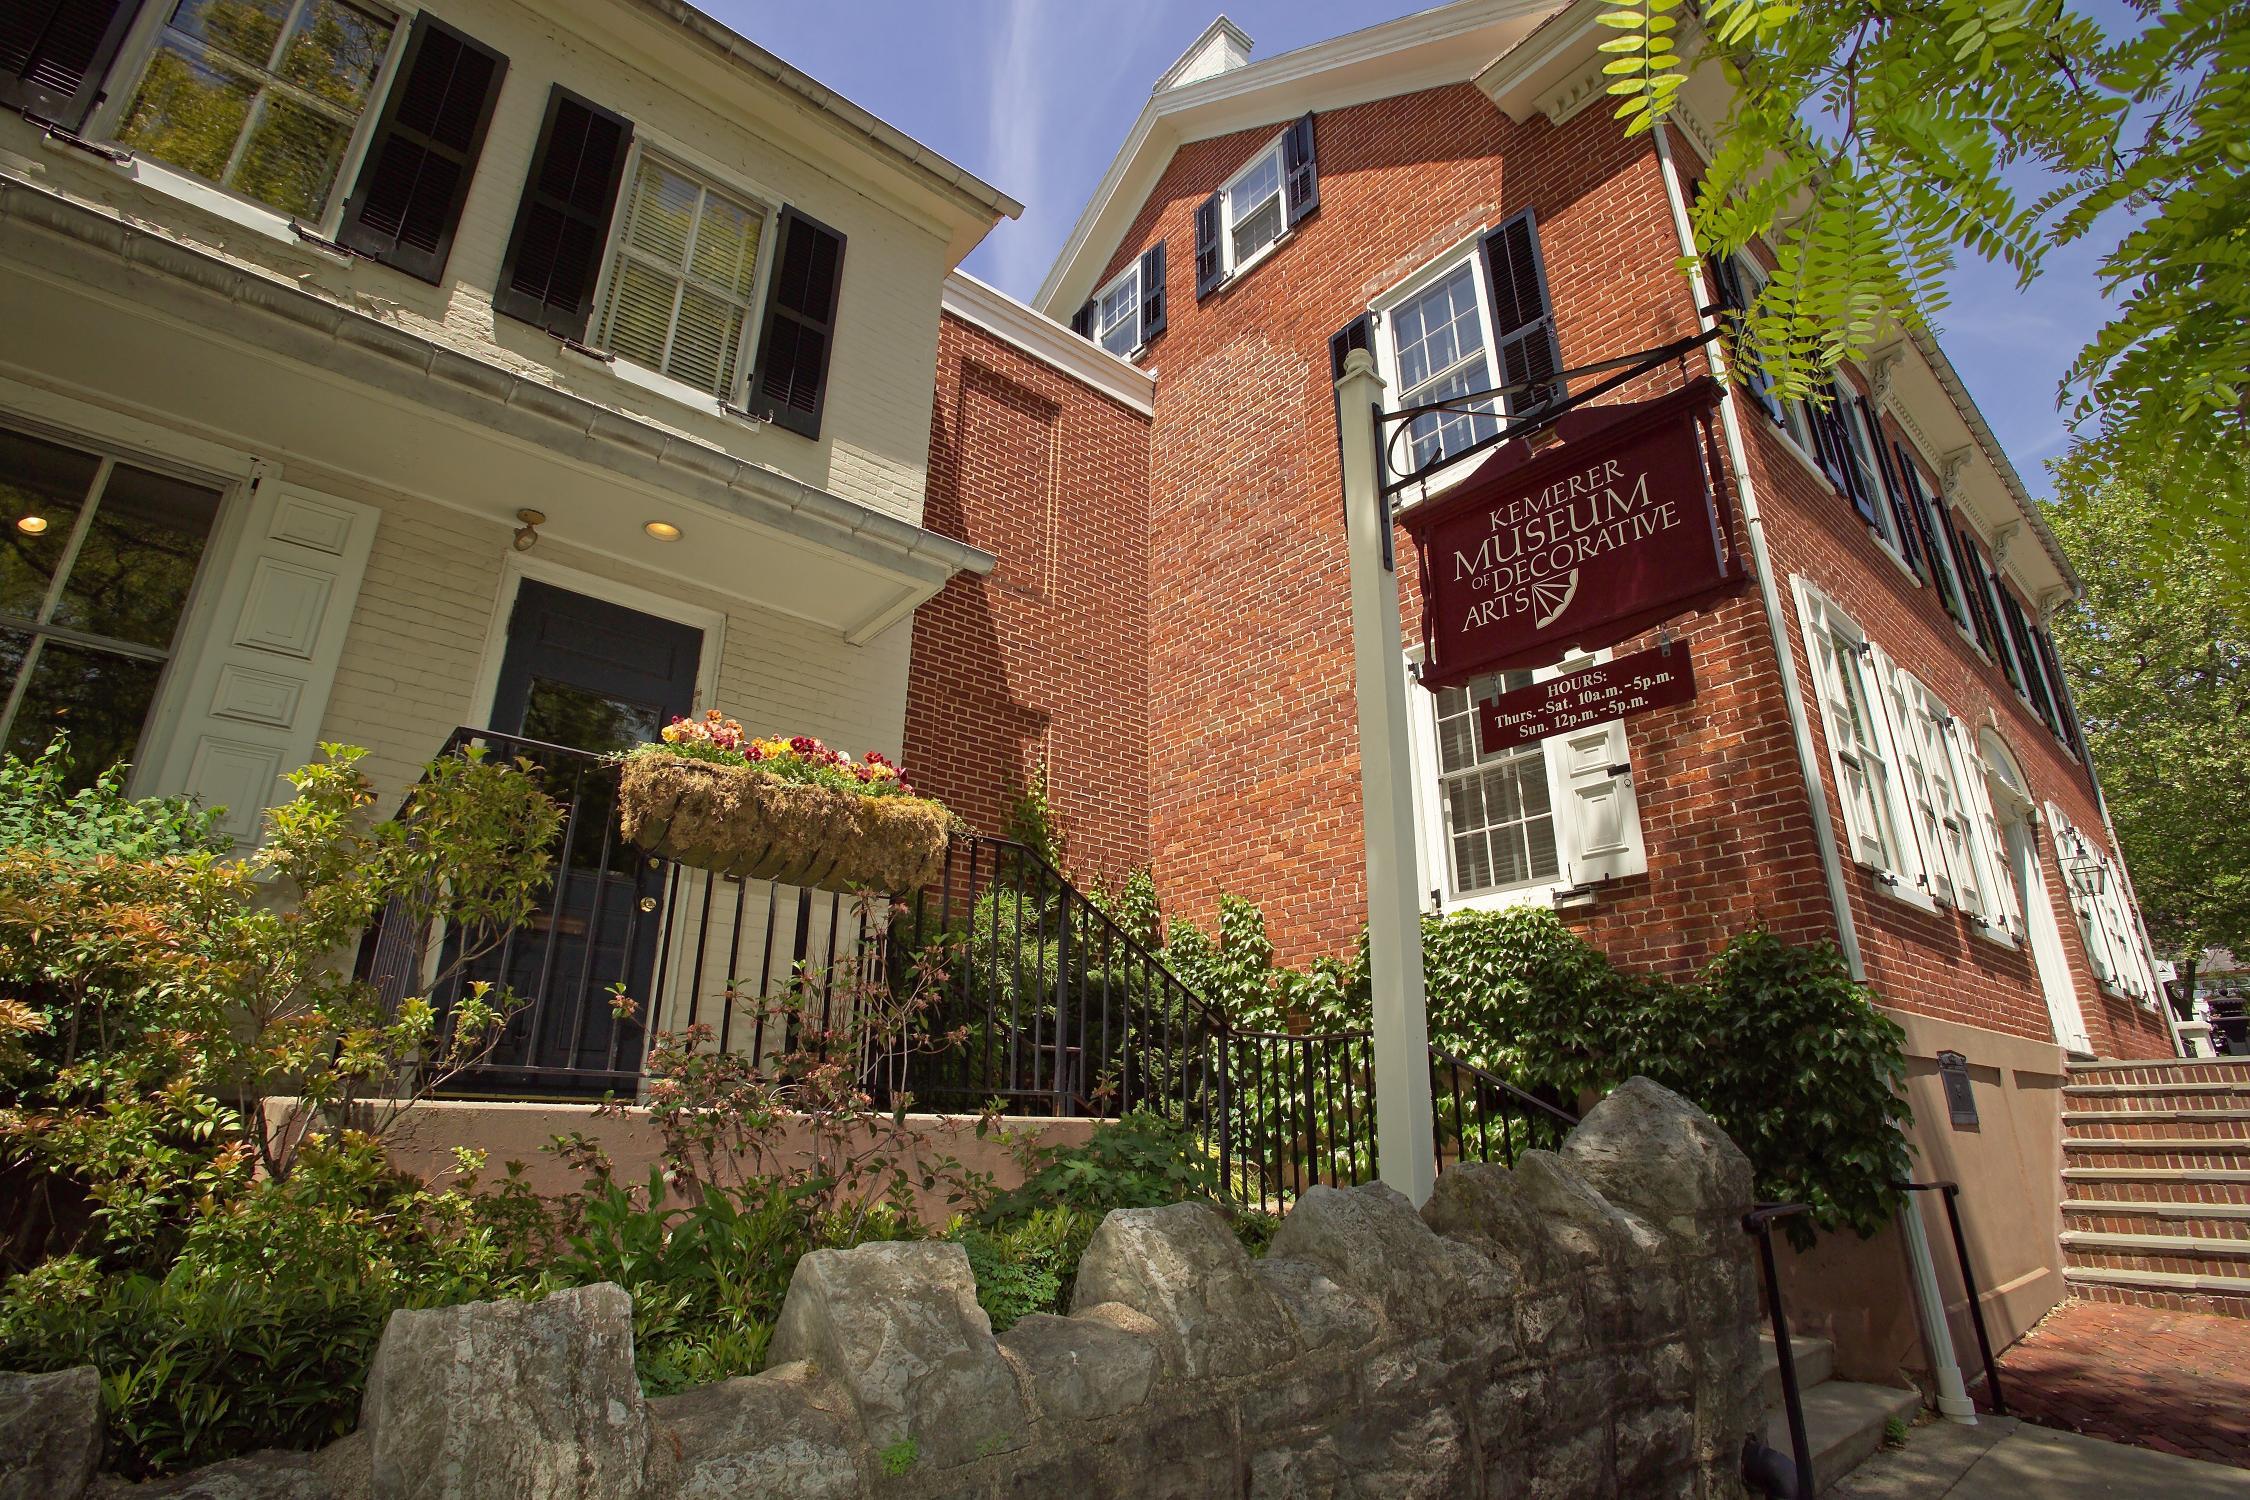 Historic Bethlehem <br />Museums & Sites | Bethlehem, PA 18018